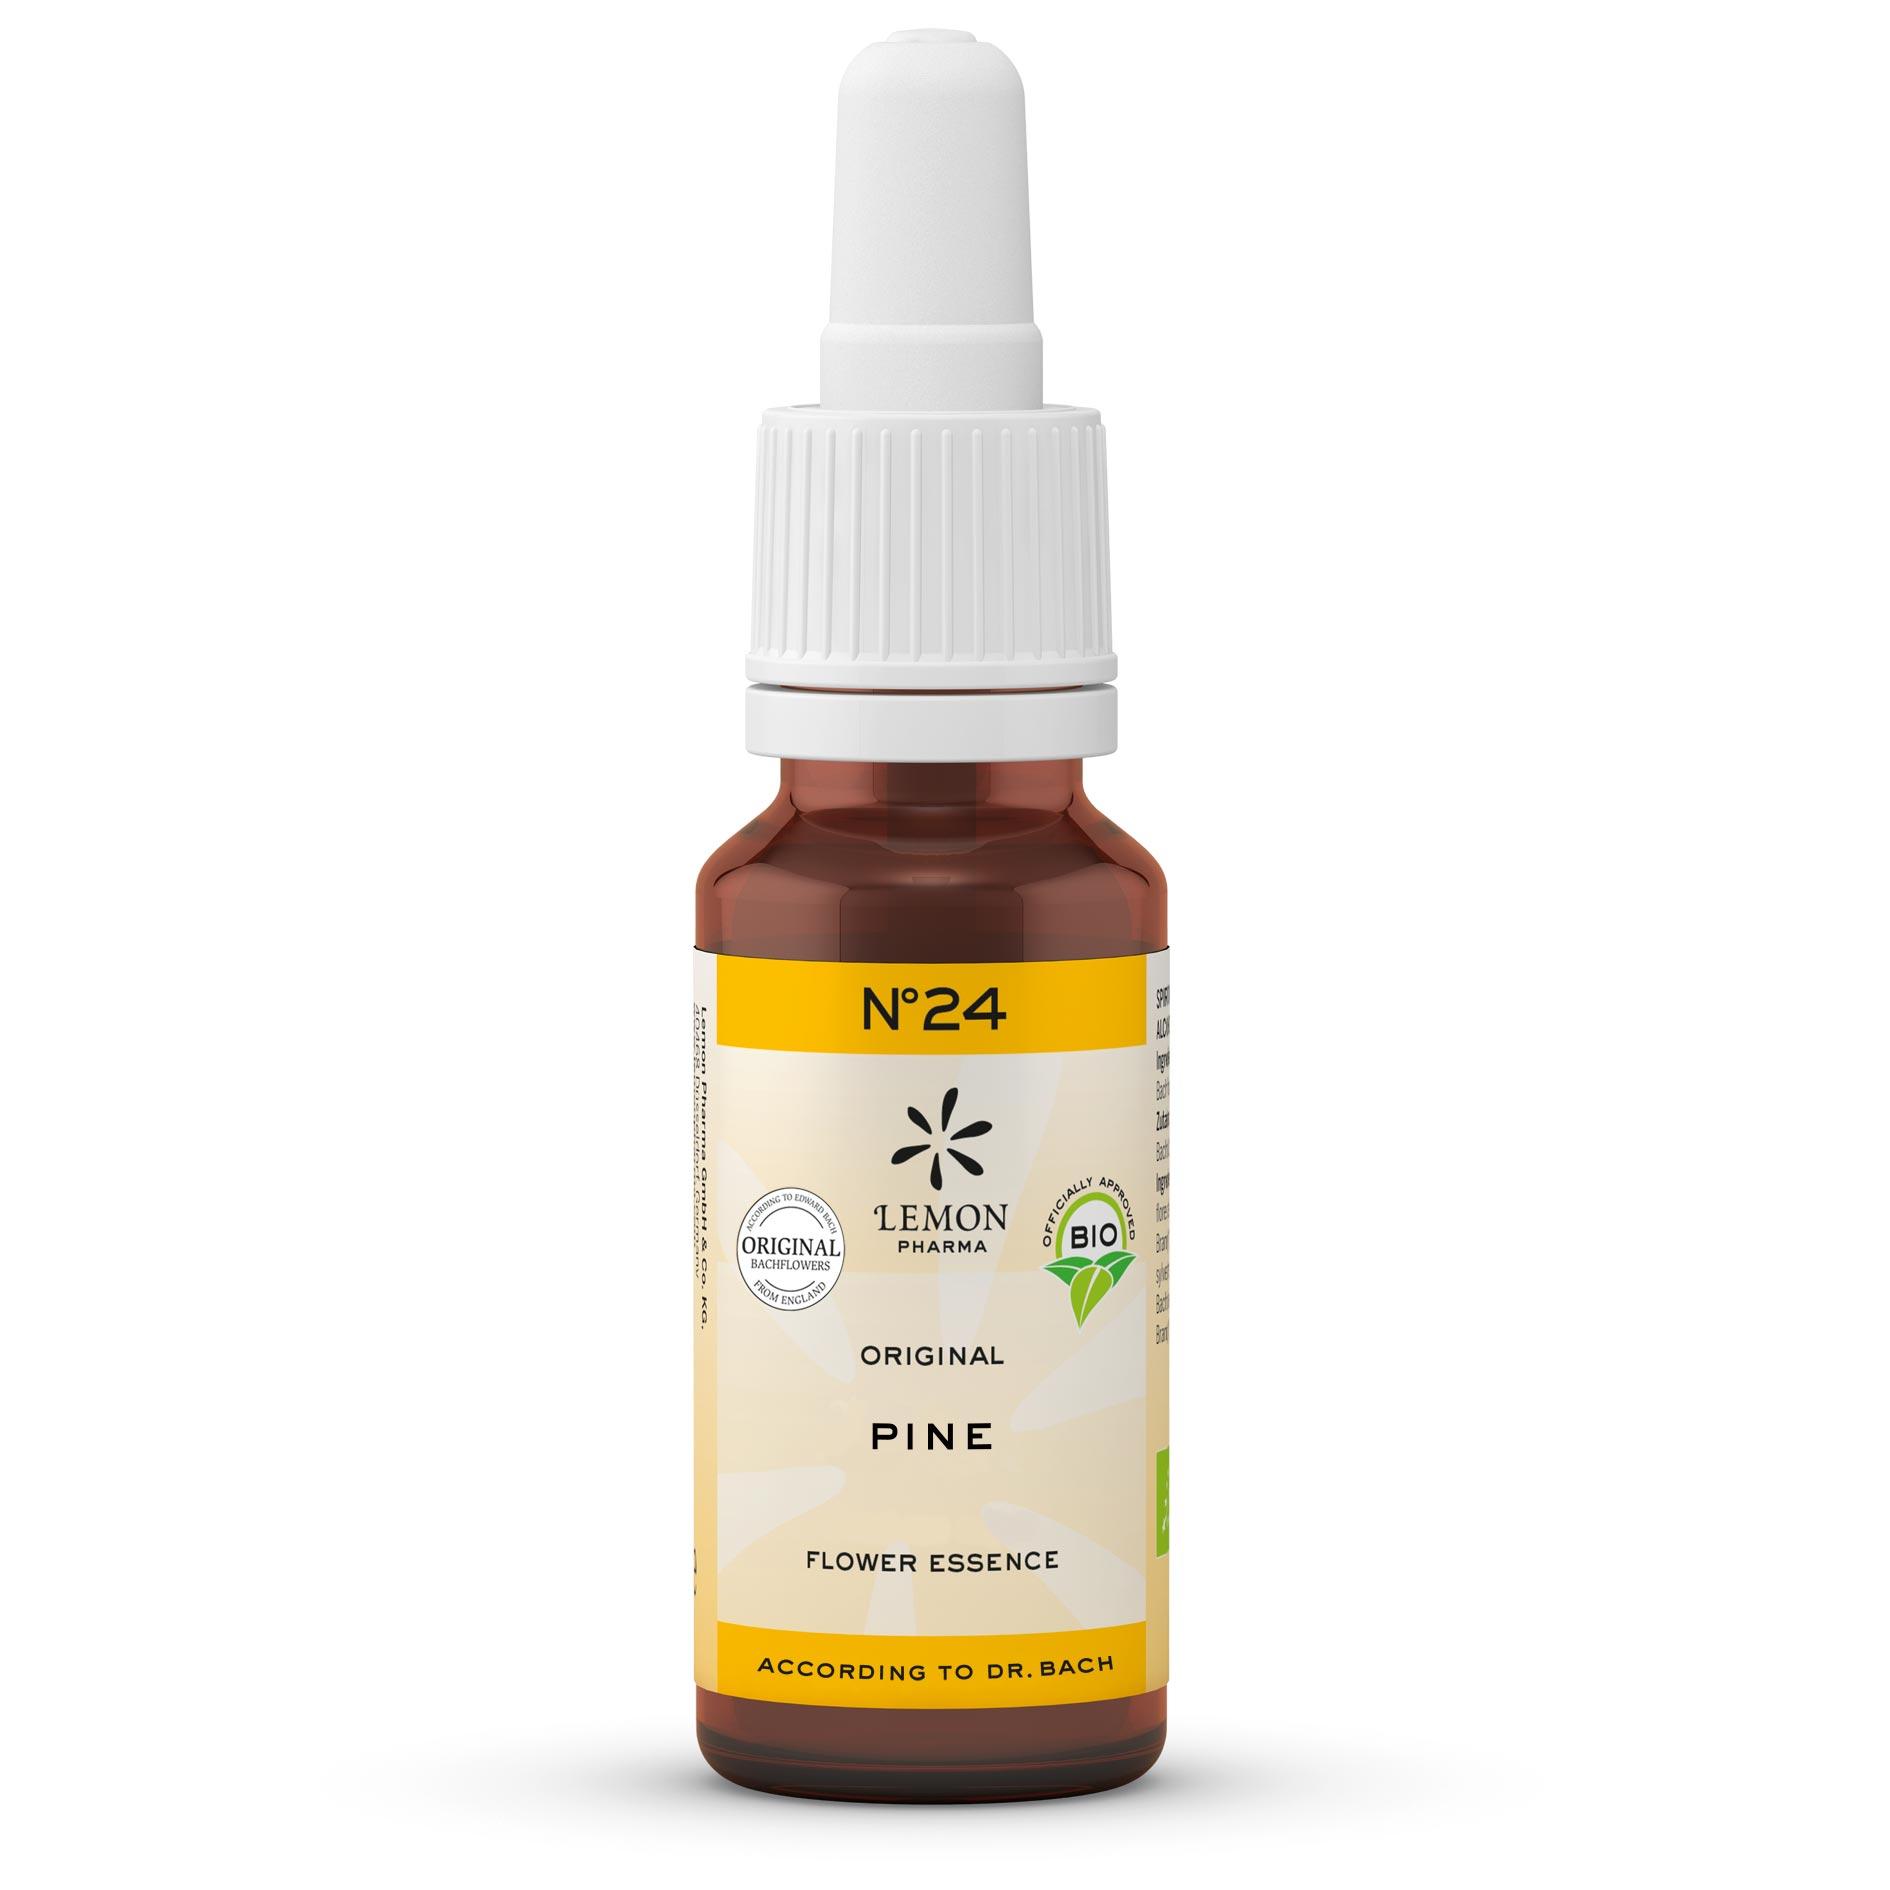 Lemon Pharma Original Bachblüten Tropfen Nr 24 Pine Schottische Kiefer Vergebung